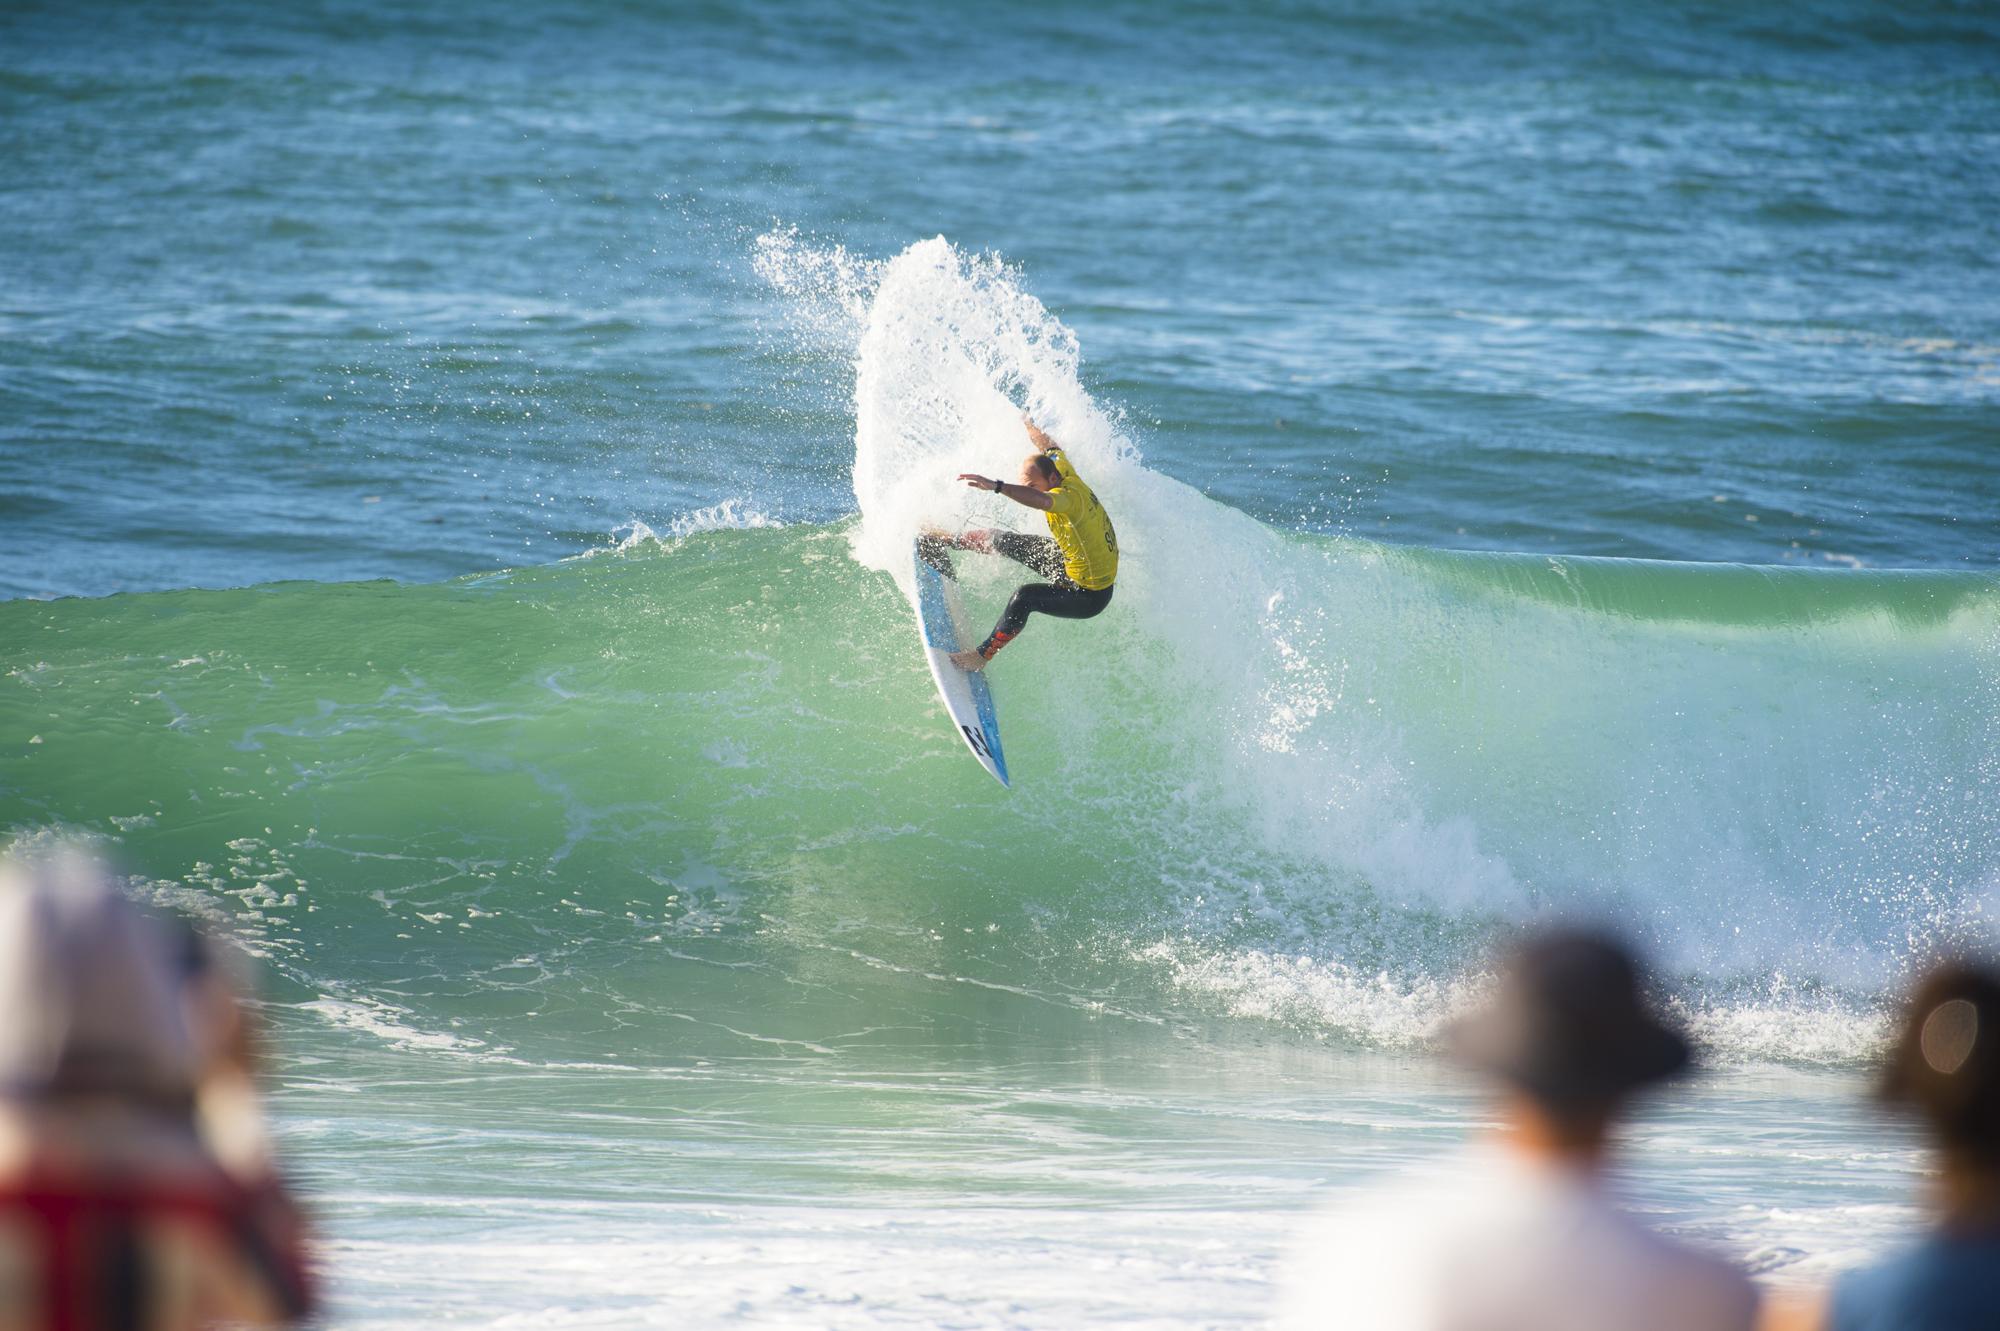 https://www.ligue-bretagne-surf.bzh/wp-content/uploads/2018/01/CDF2017_HOSSEGOR_©JUSTES_JUS4349.jpg